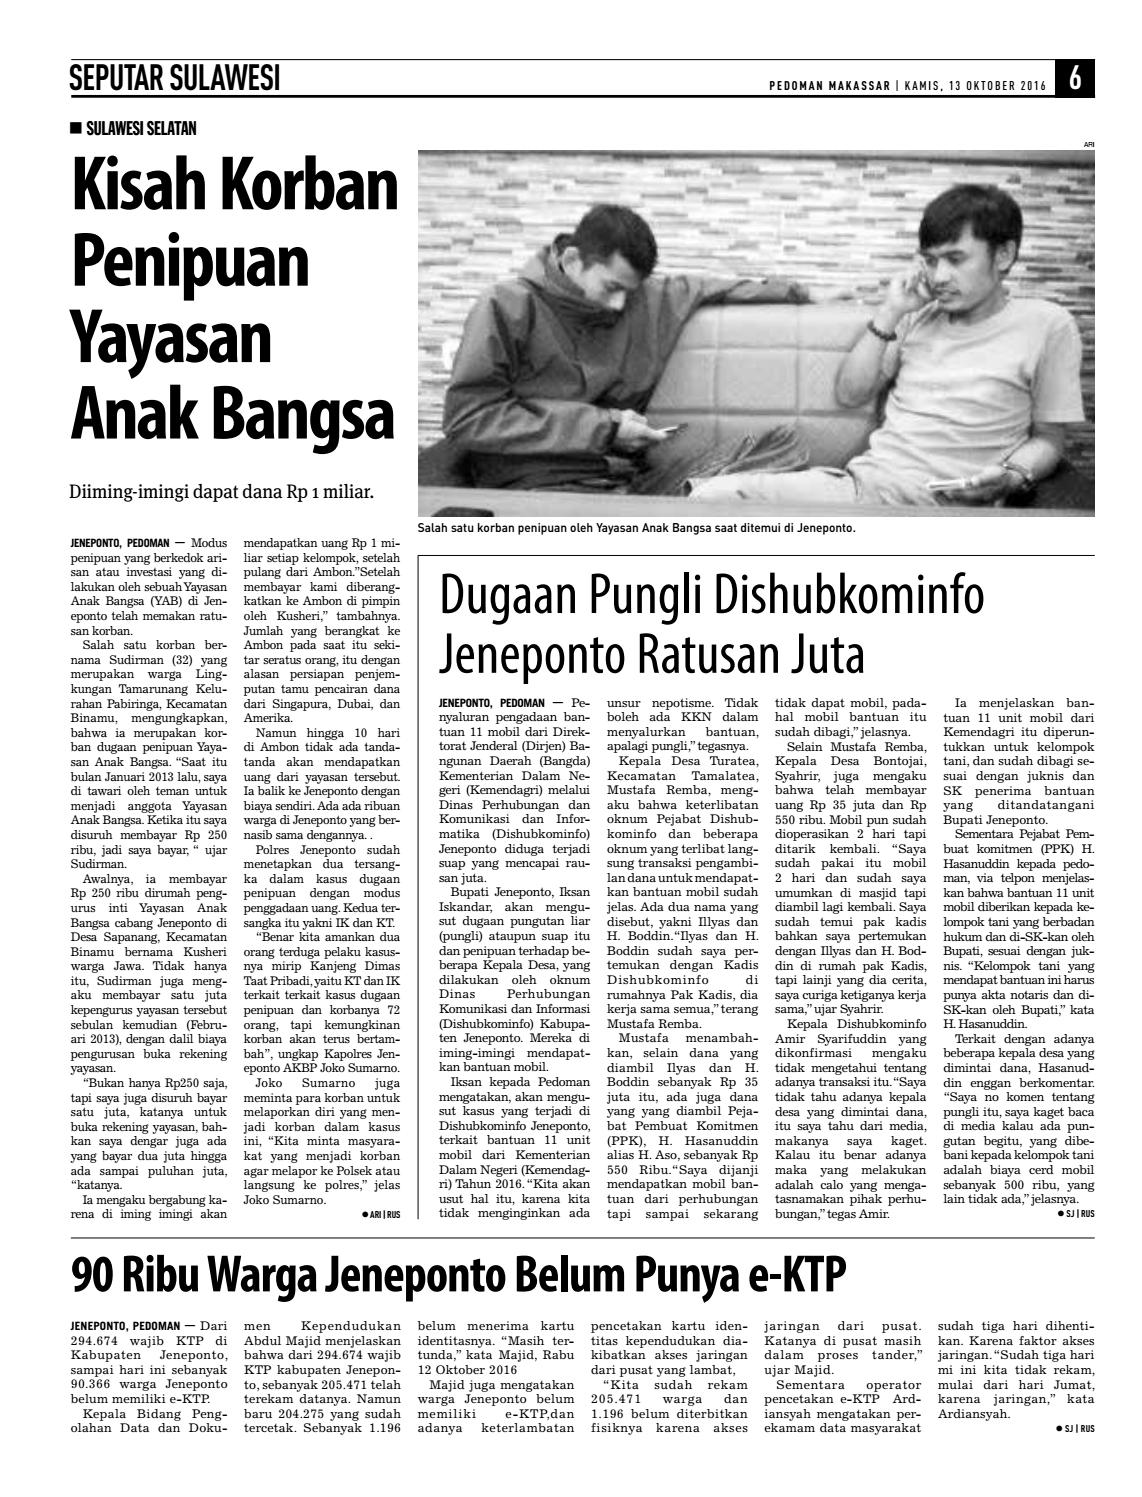 Edisi 70 13 Oktober 2016 Pedoman Makassar By Pedoman Makassar